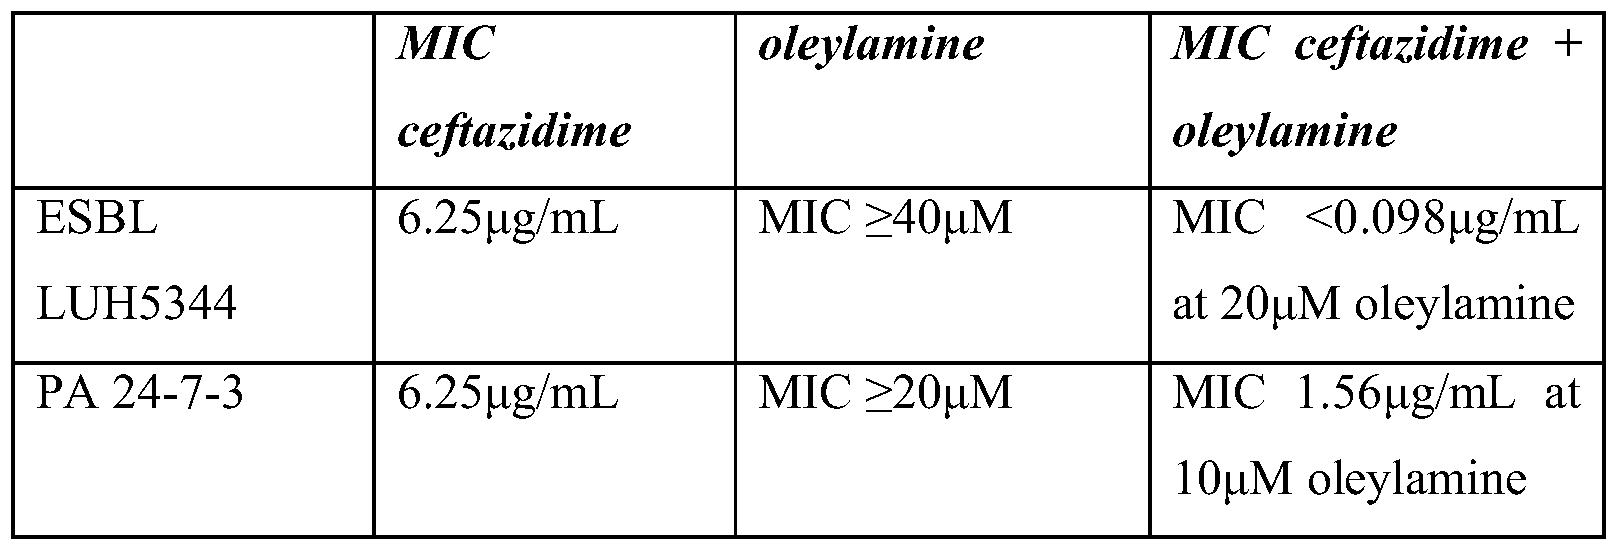 enterococcus faecalis sensitivity towards ampicillin penicillin Enterococcus faecium has six penicillin-binding proteins (pbp), where pbp5 seems to be the main target for beta-lactam antibiotics the pbp profiles of three imipenem-resistant, ampicillin.